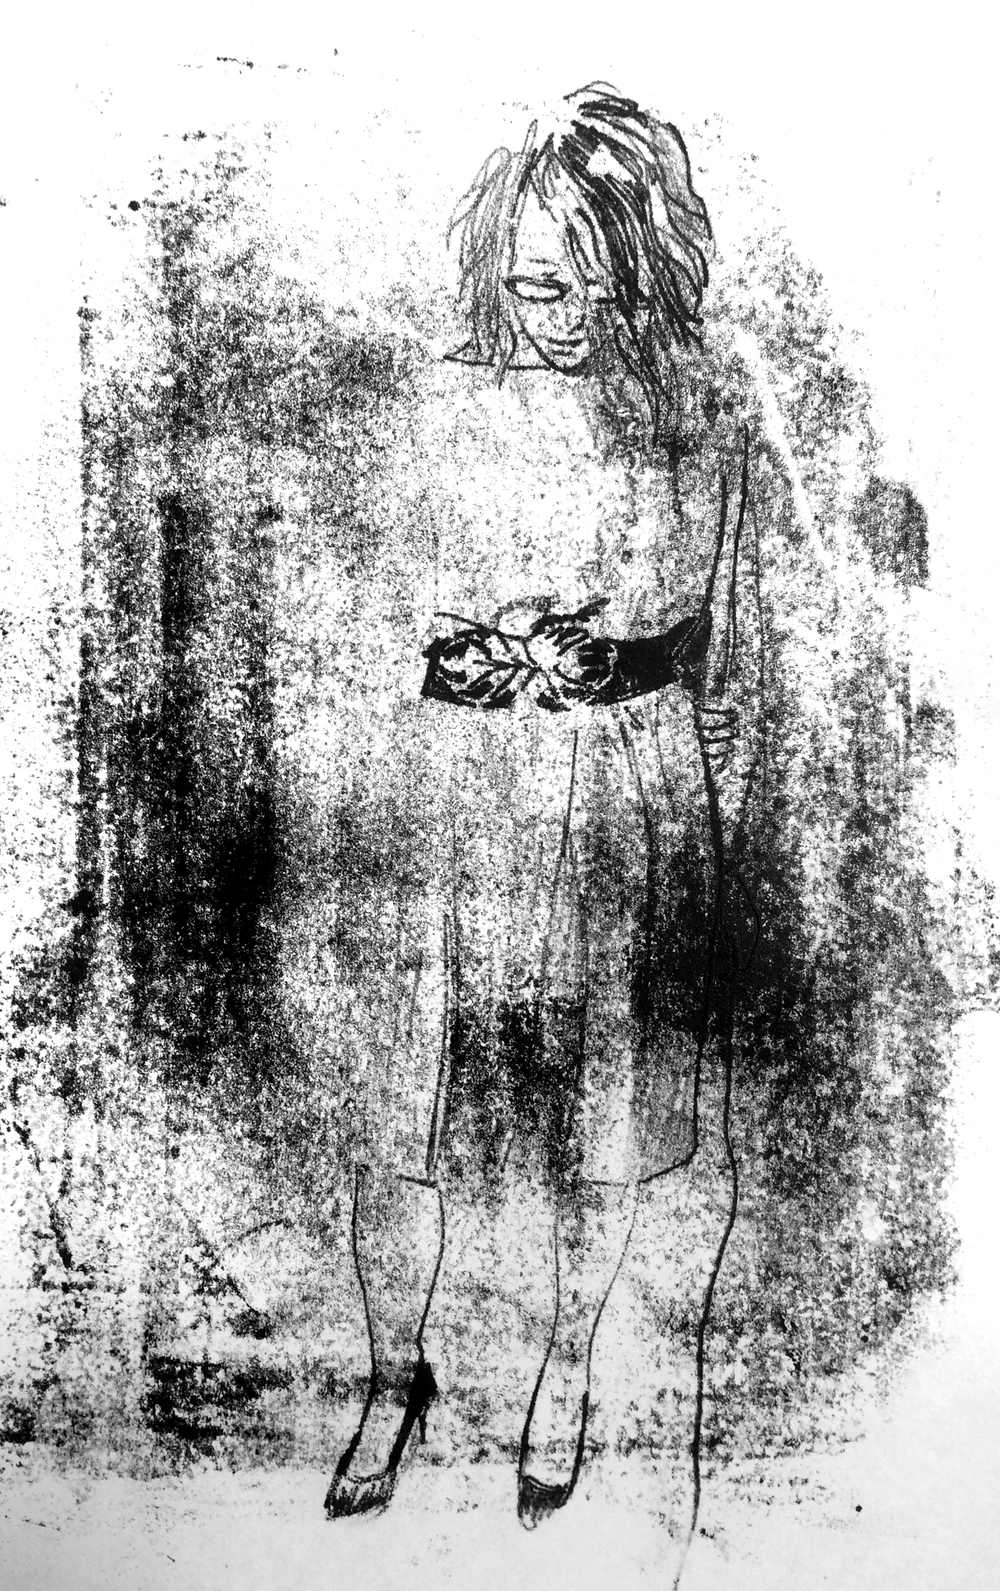 'Fraubraun', 2015, monoprint on plain paper, 21 x 29.5 cm